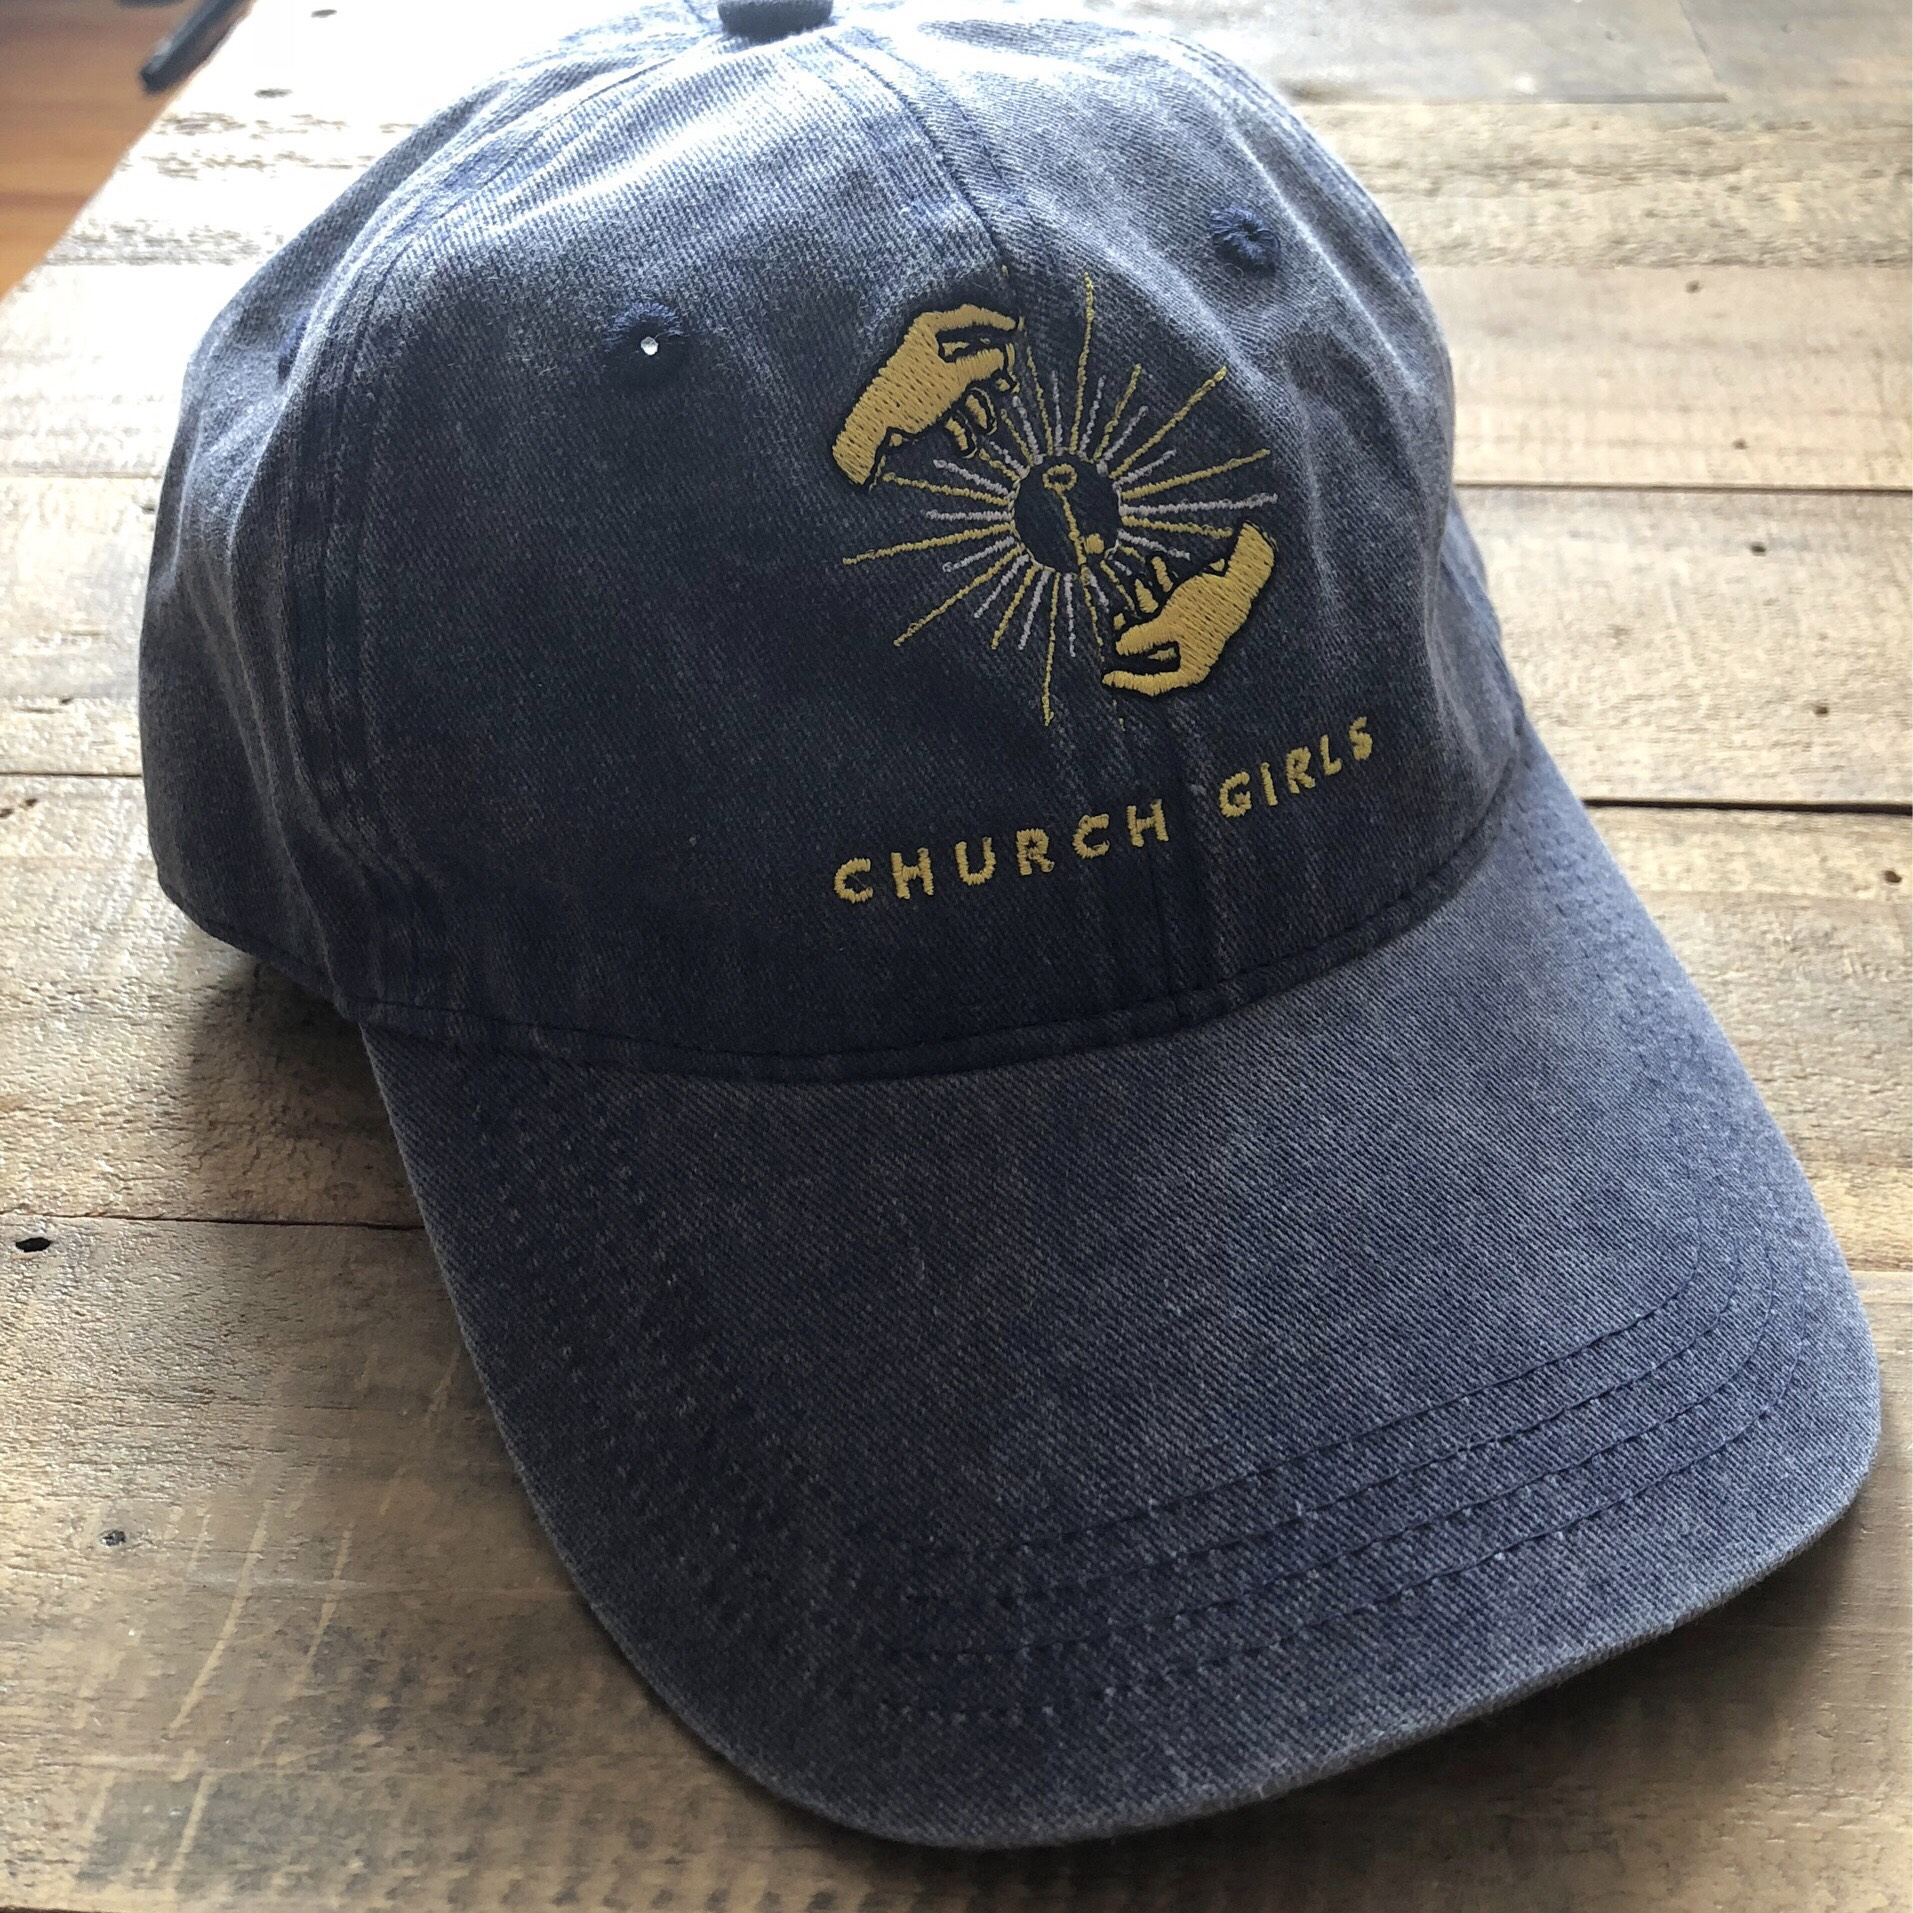 Church Girls - Hats / Enamel Pins